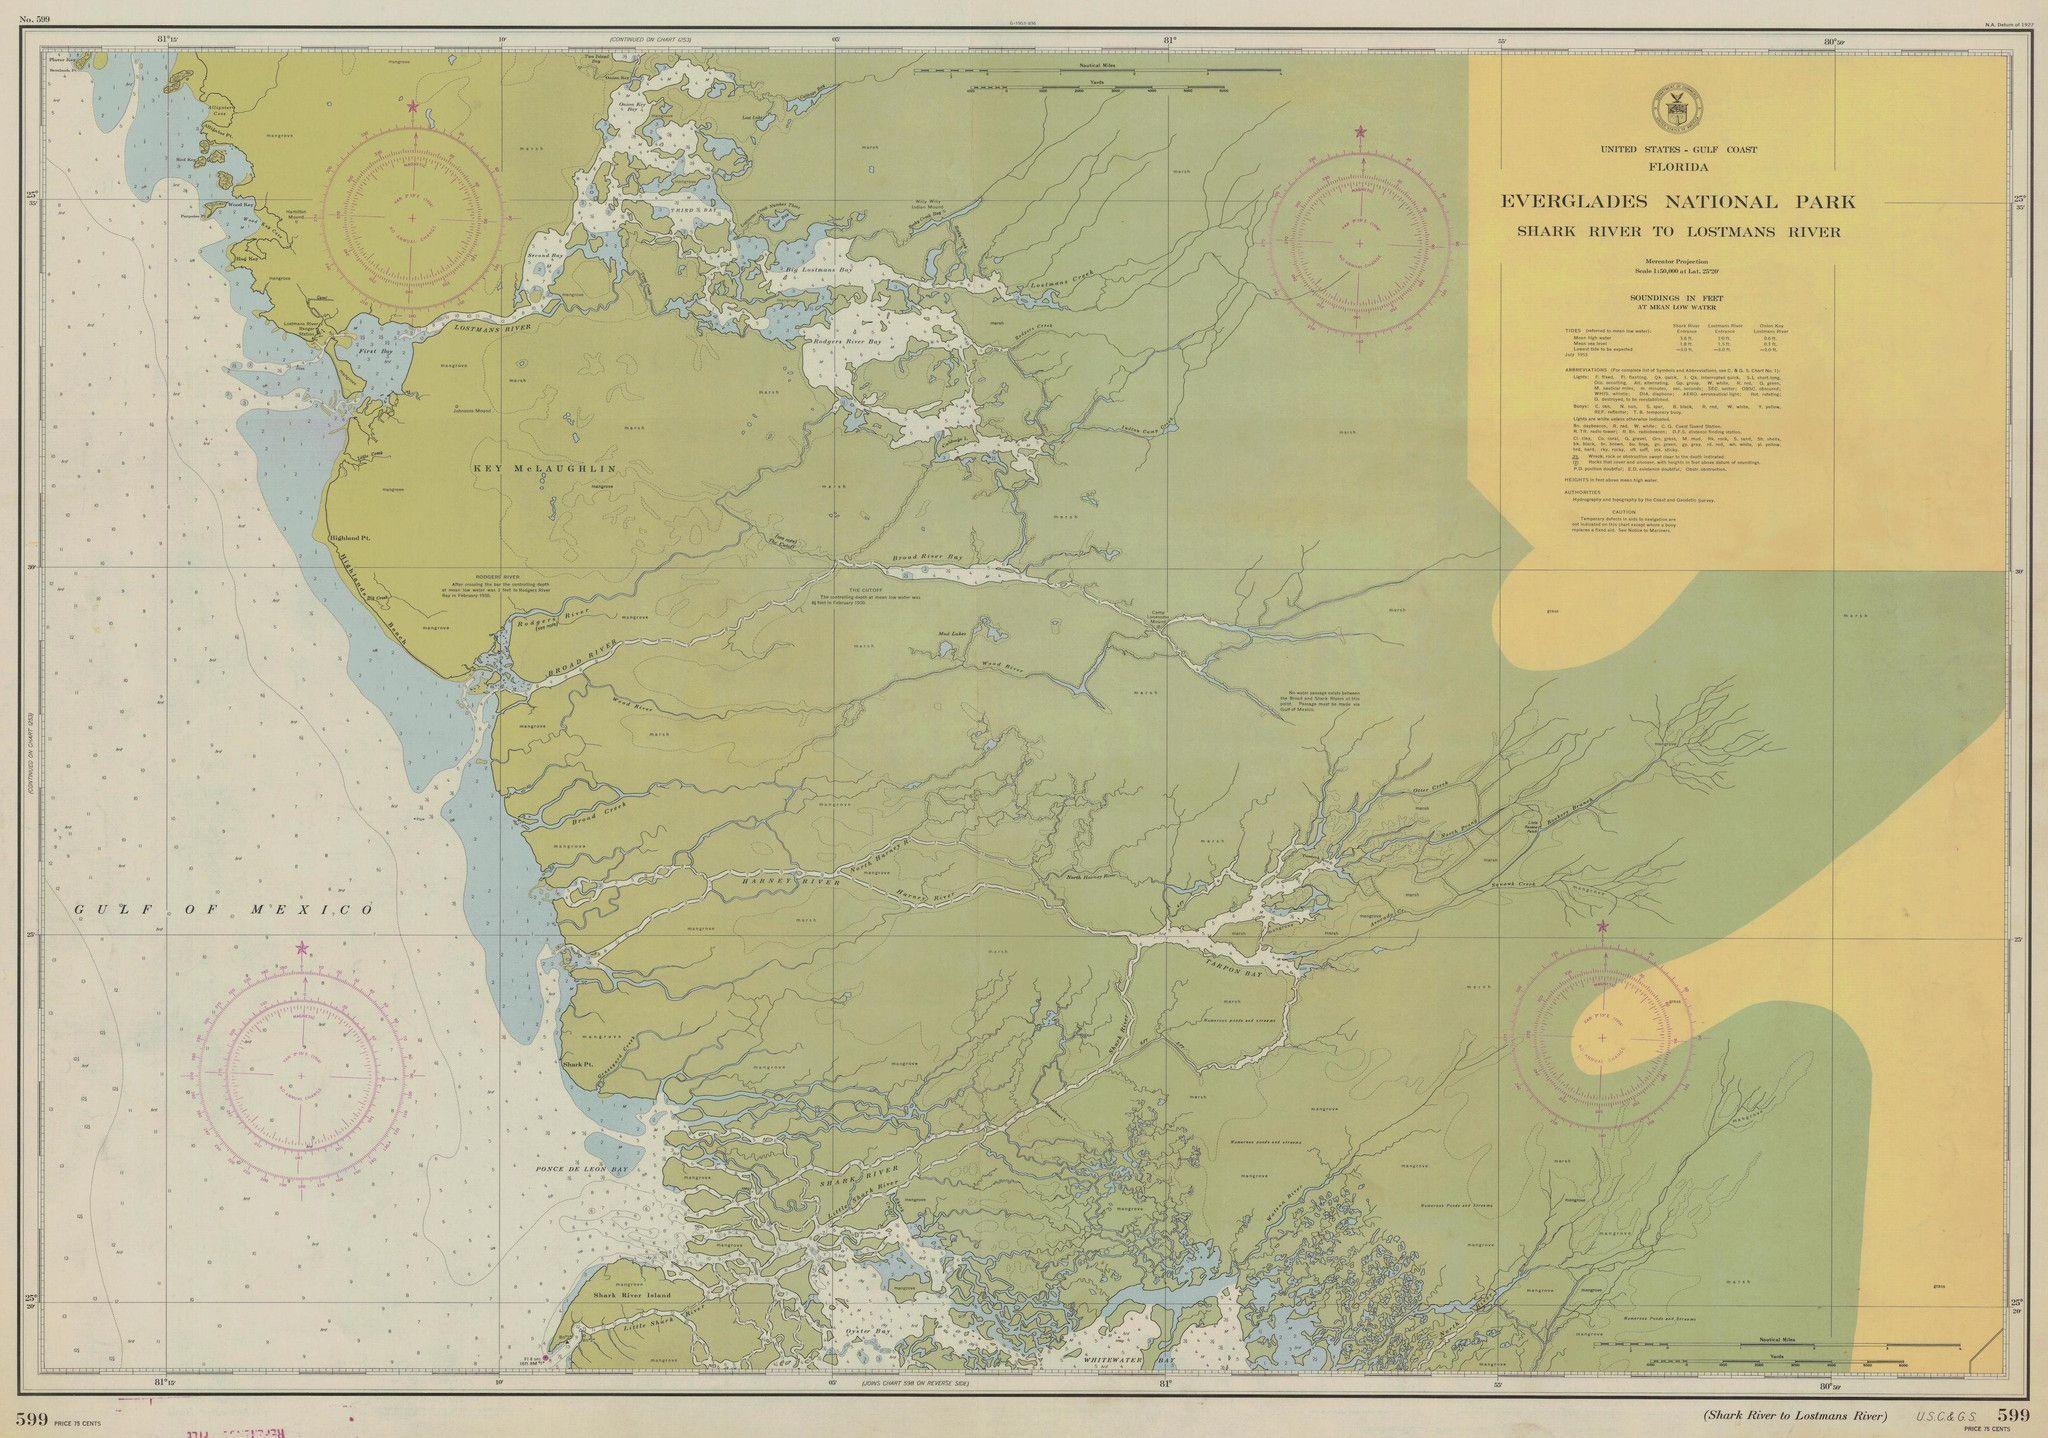 Everglades National Park Historical Map Everglades - Everglades on us map